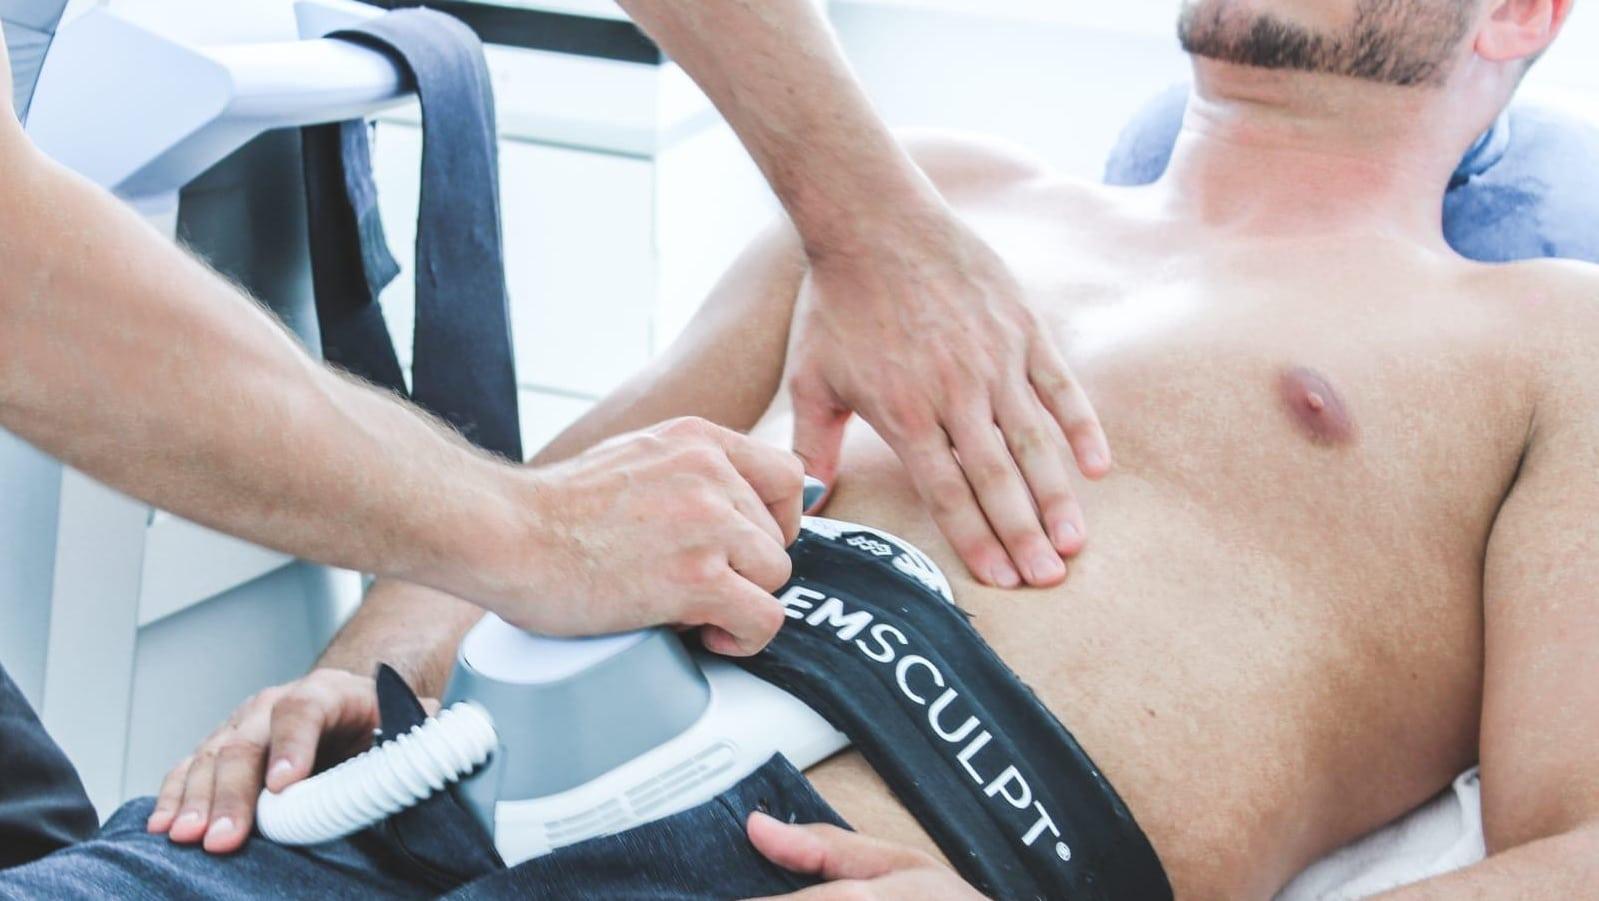 EMSculpt - Muskelaufbau und Fettreduktion bei OmniMed